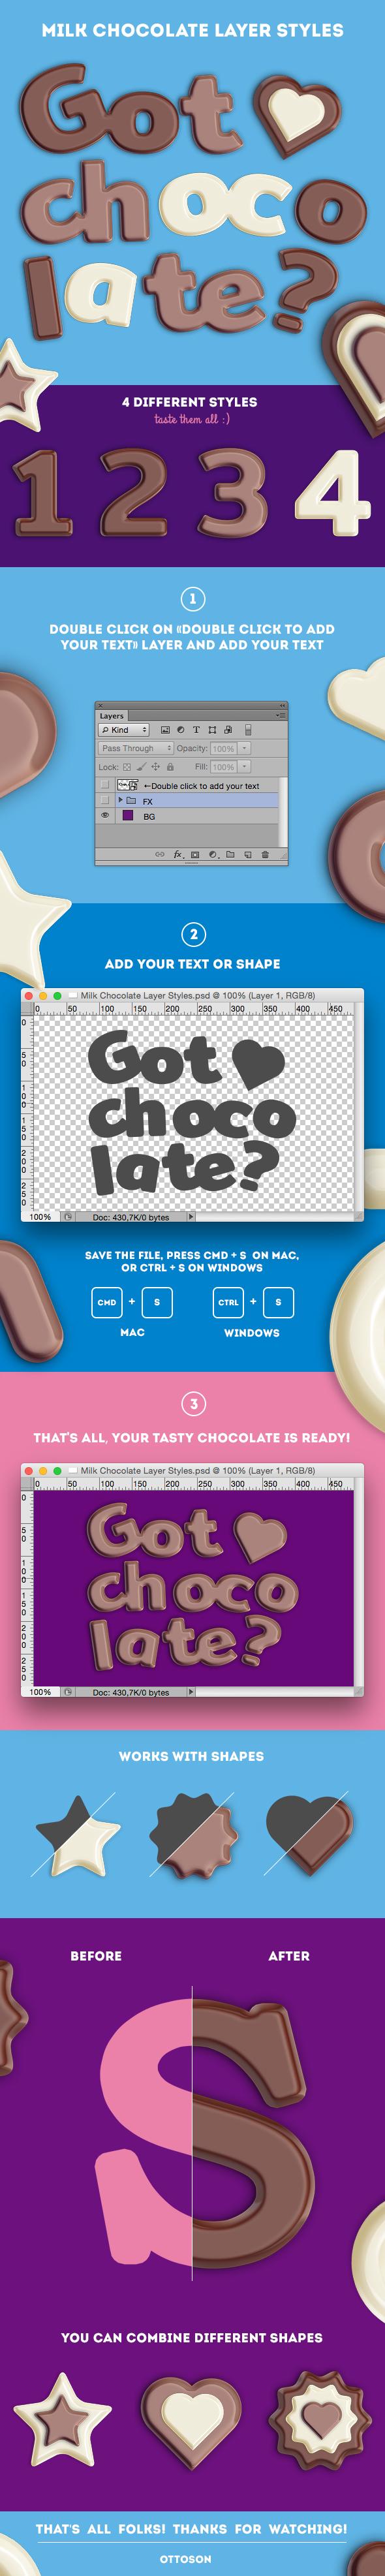 Milk Chocolate Layer Styles - Photoshop Add-ons